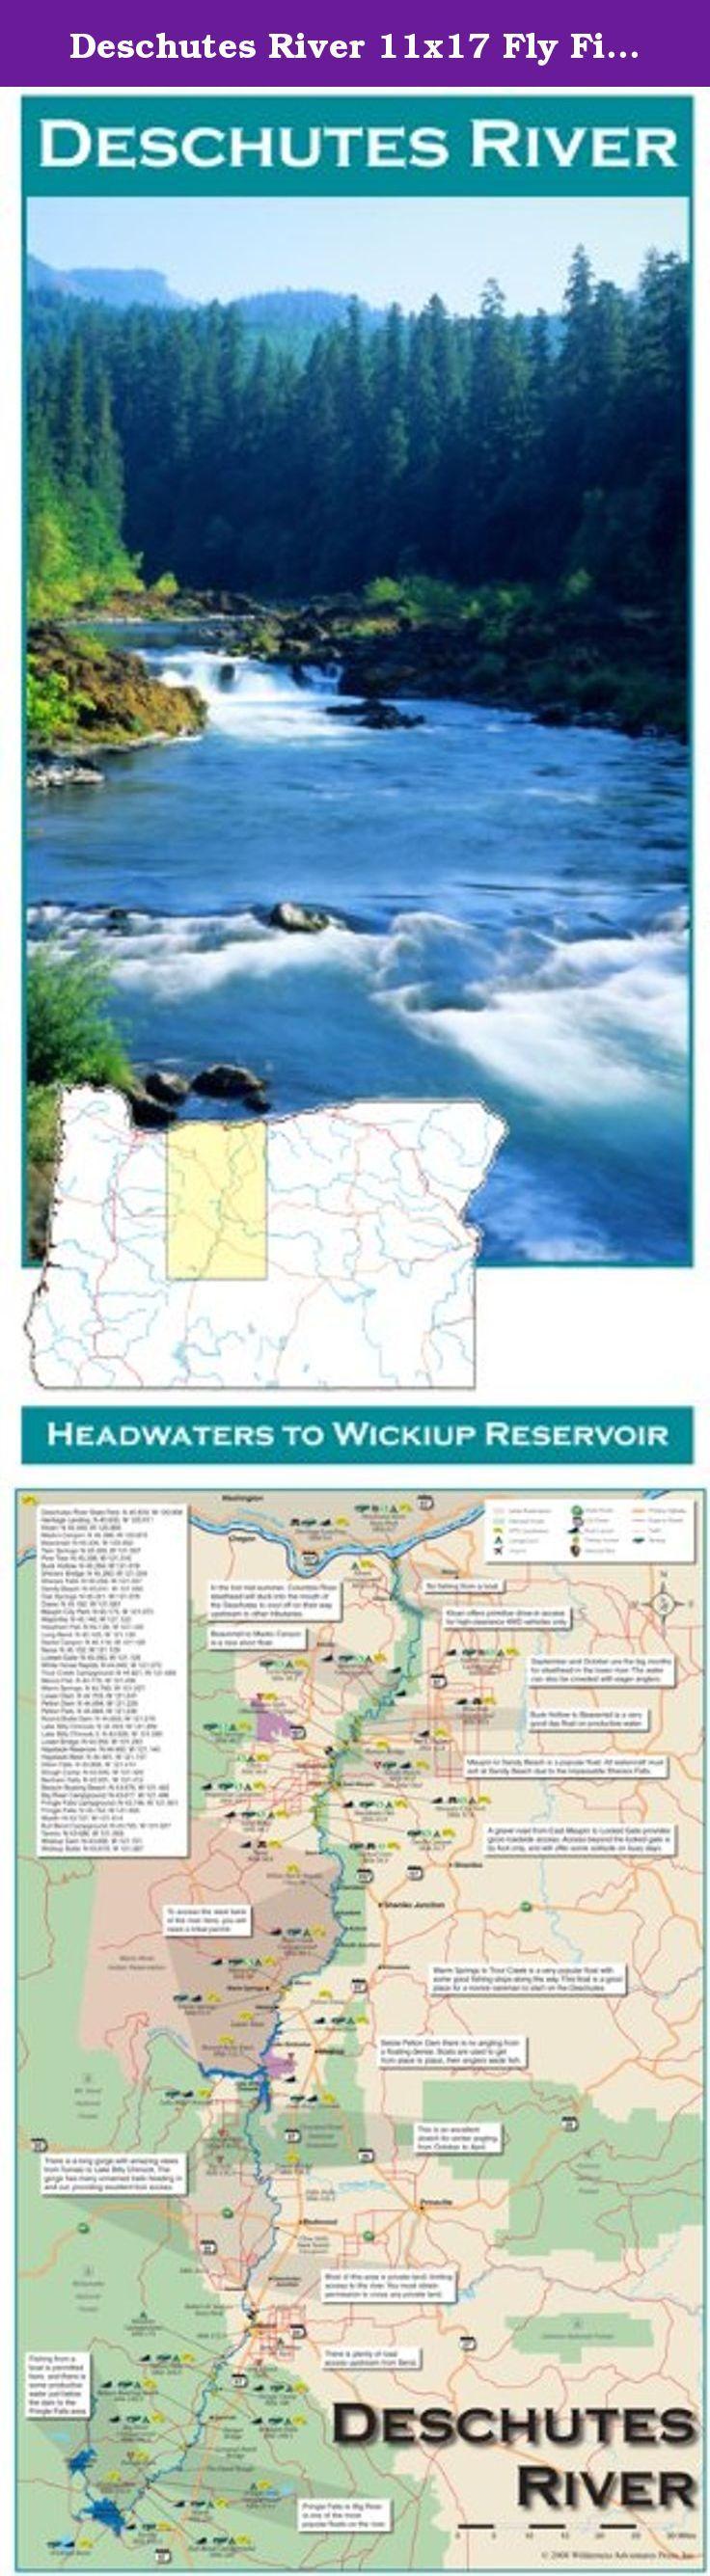 Deschutes River 11x17 Fly Fishing Map Map